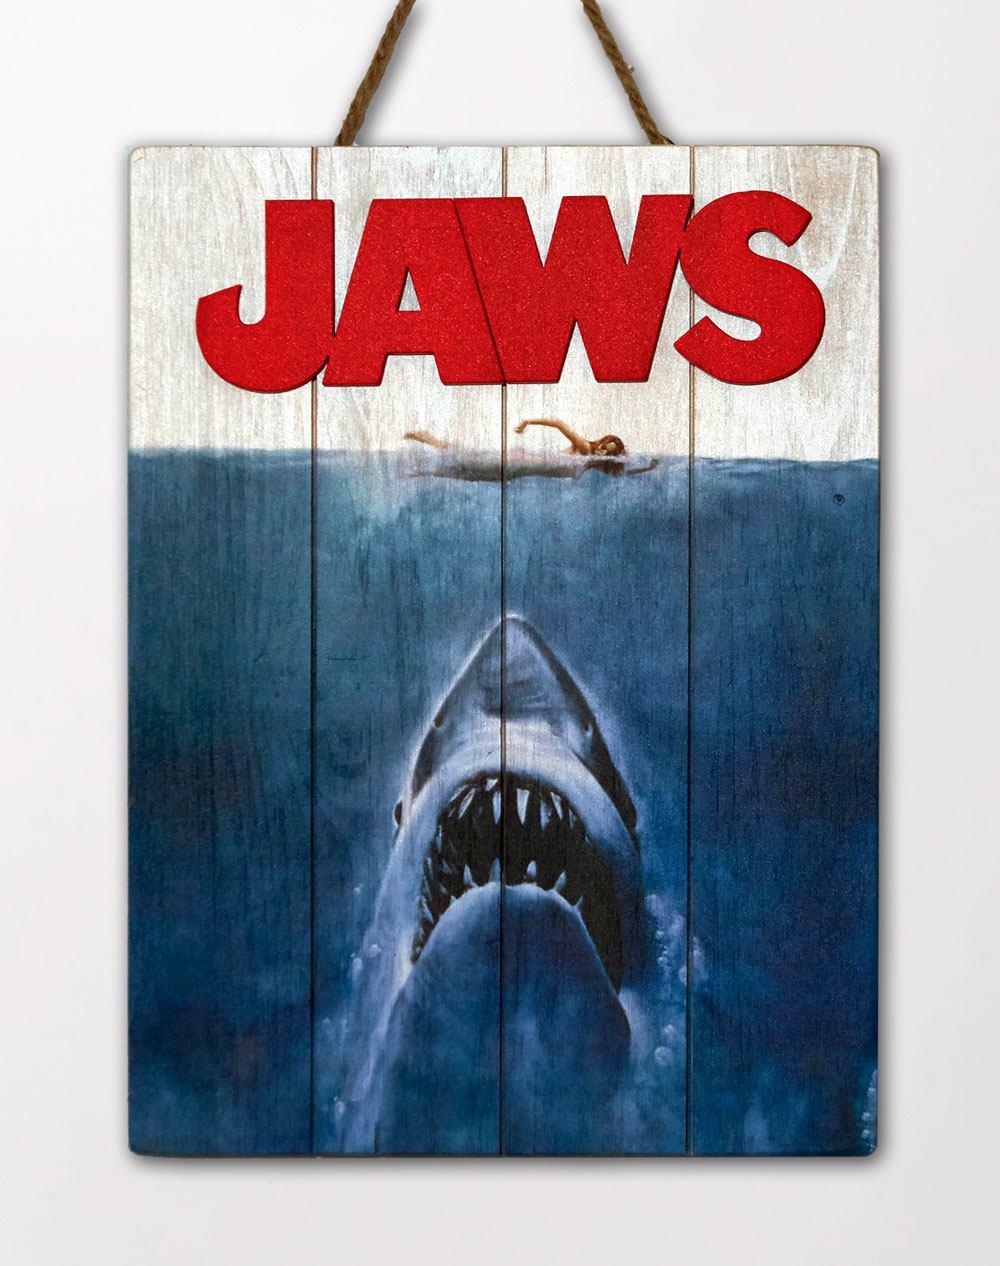 Jaws WoodArts 3D Wooden Wall Art Shark Attack 30 x 40 cm